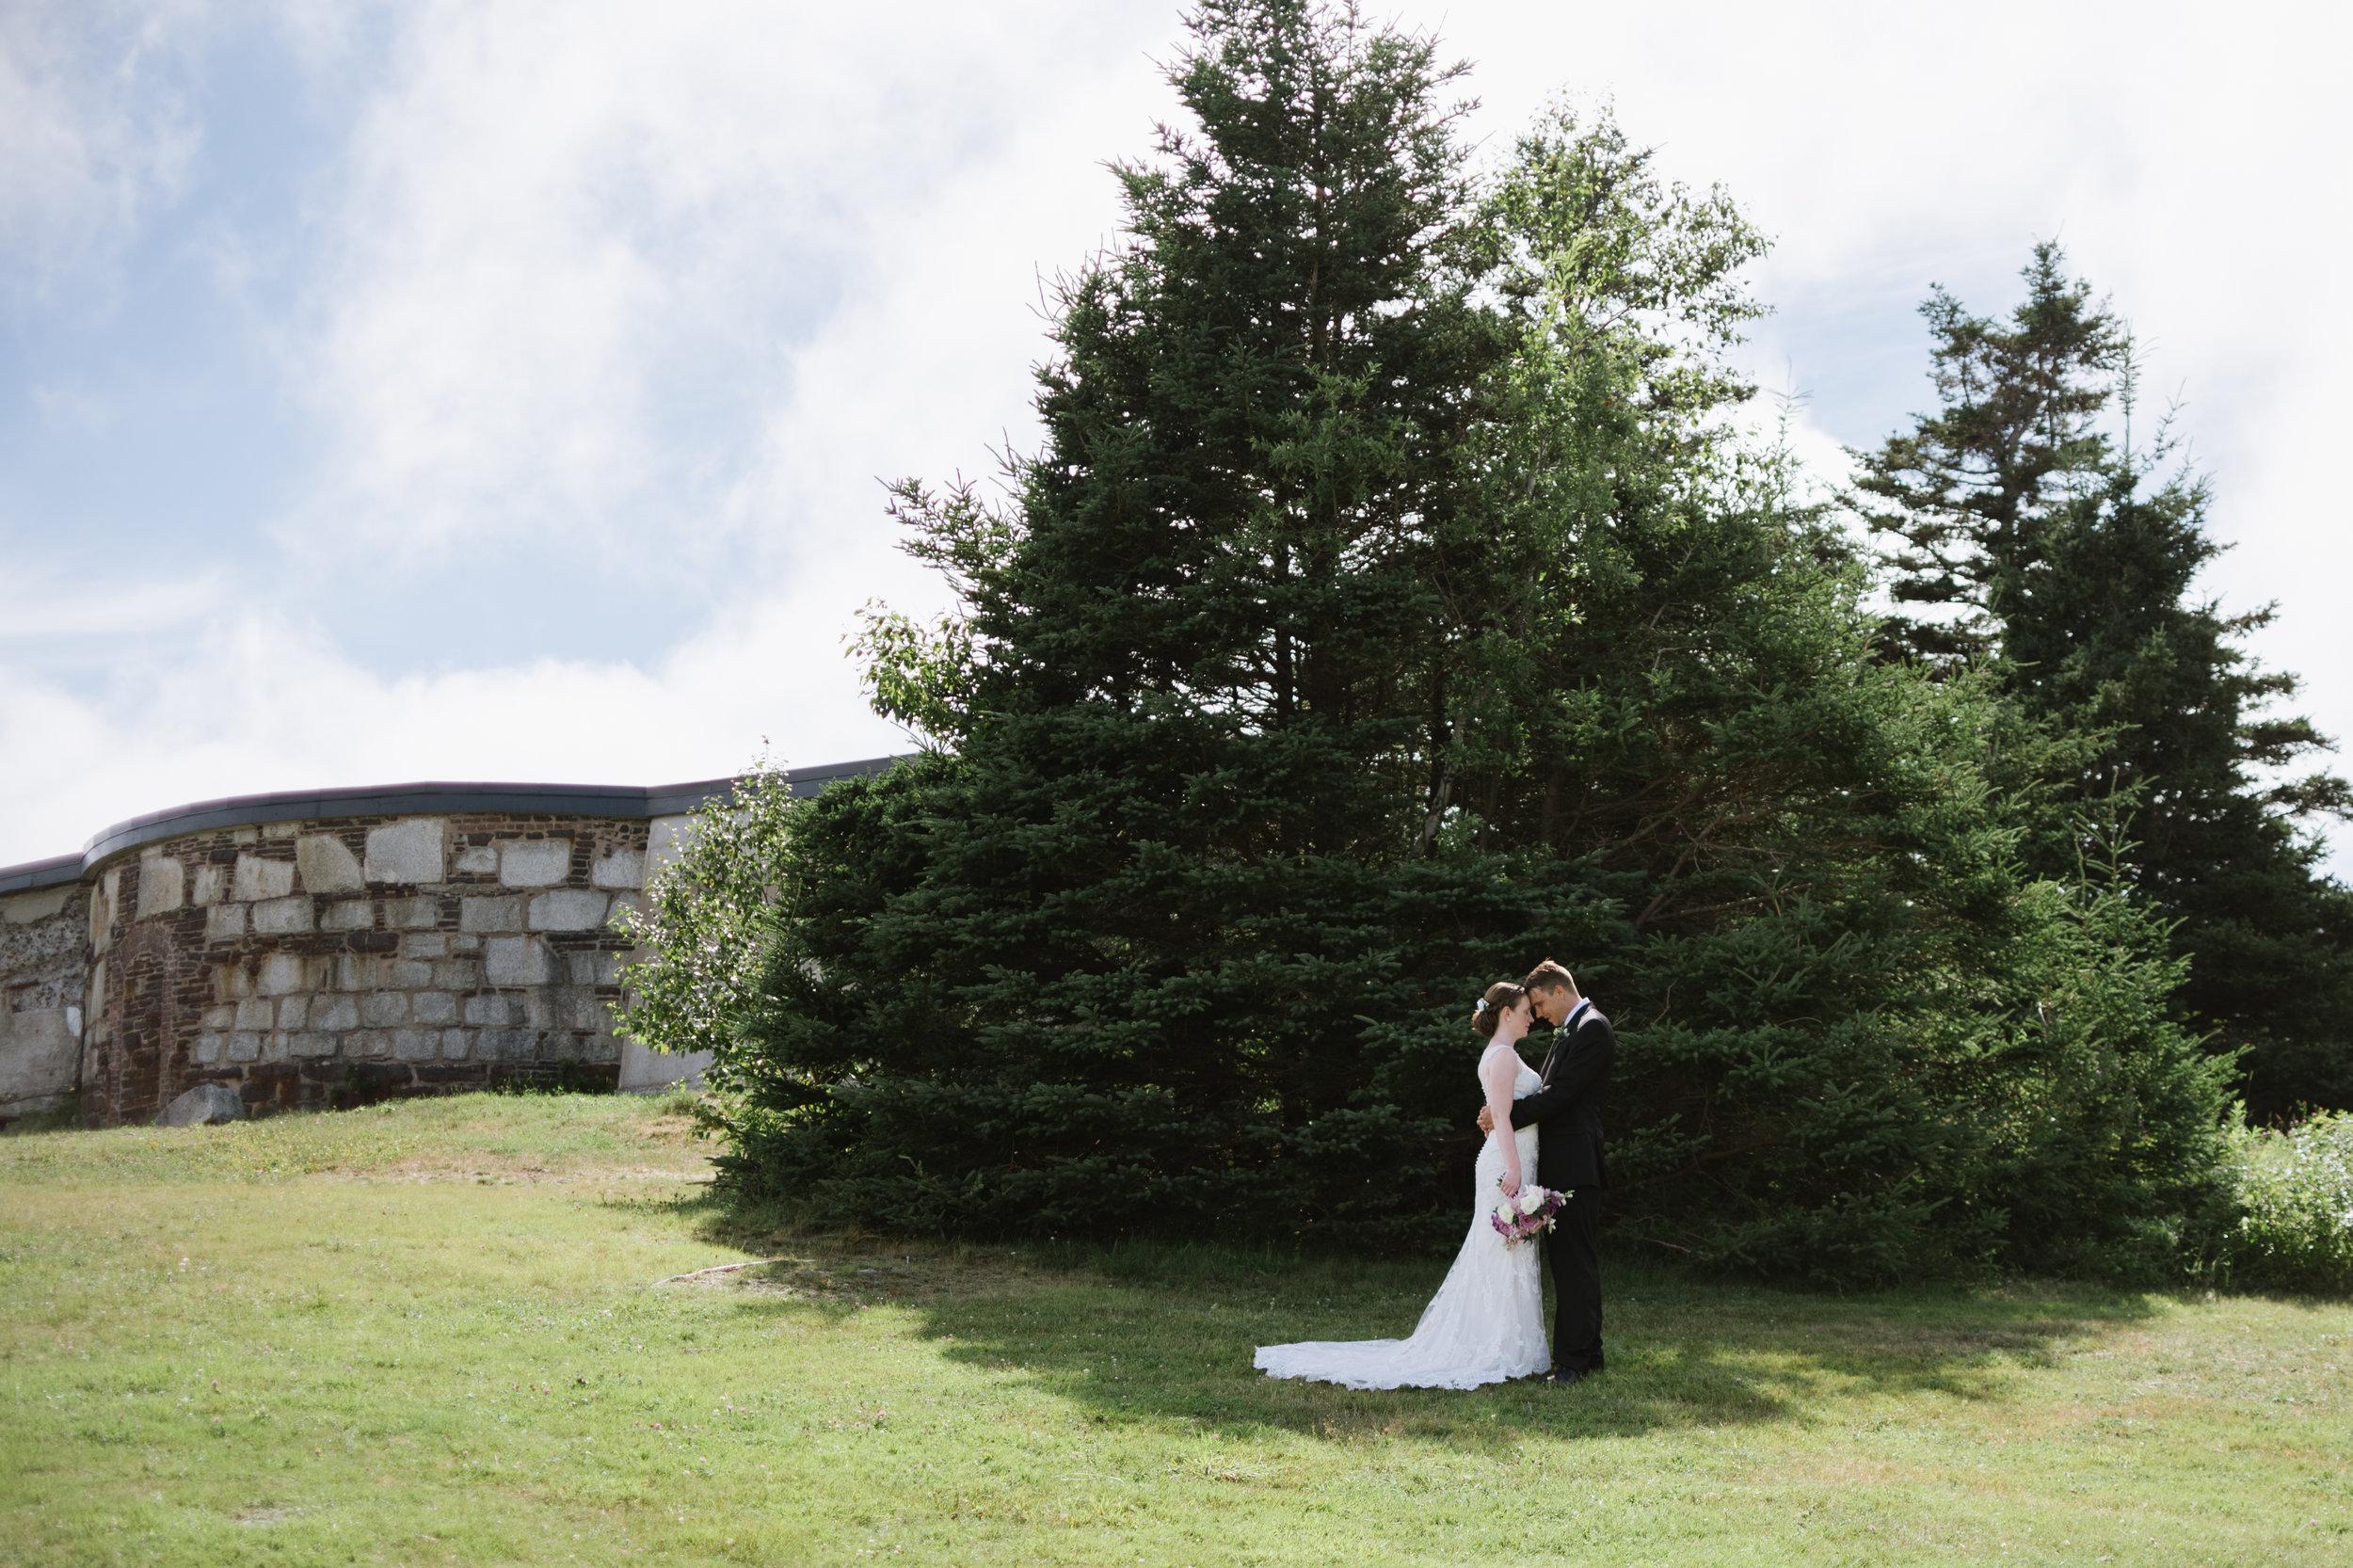 Martina & Scott Halifax Wedding Photographer - Sinead Dubeau Photography 08